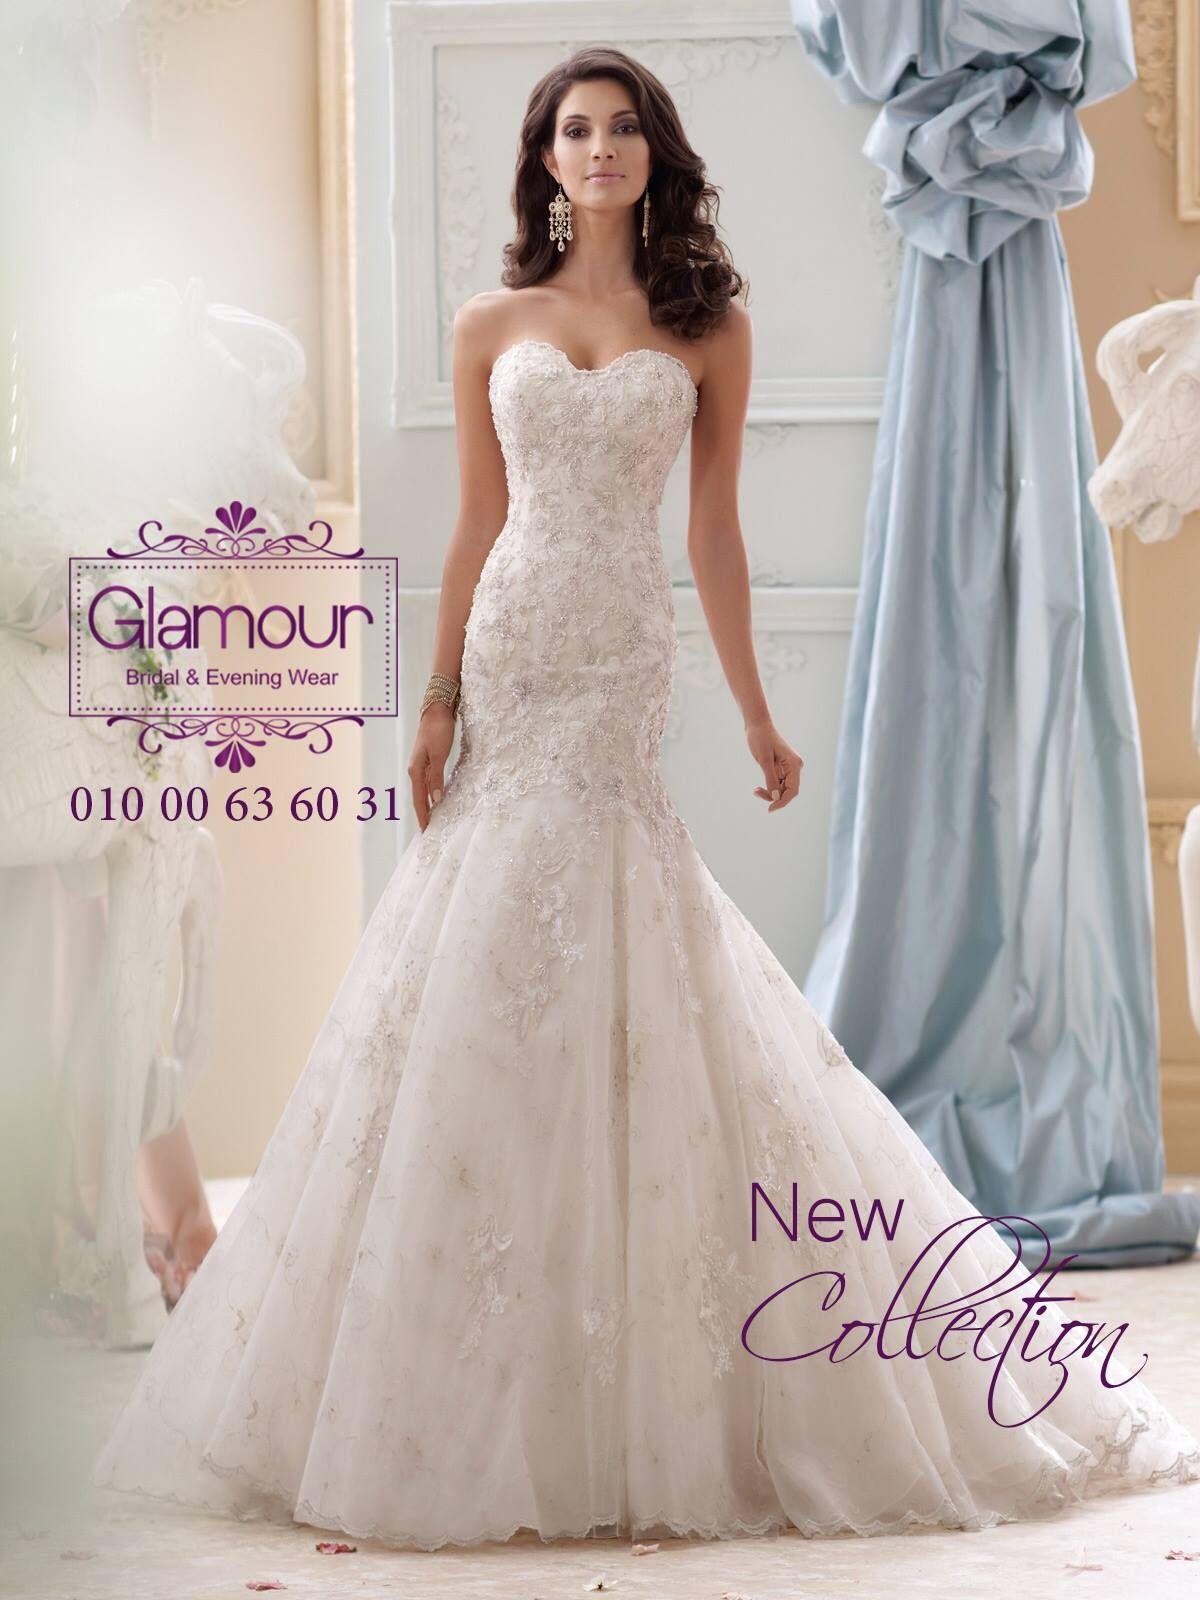 ONLY @ Glamour Bridal & Evening Wear ☎ 01000636031 #GlamourBridal ...